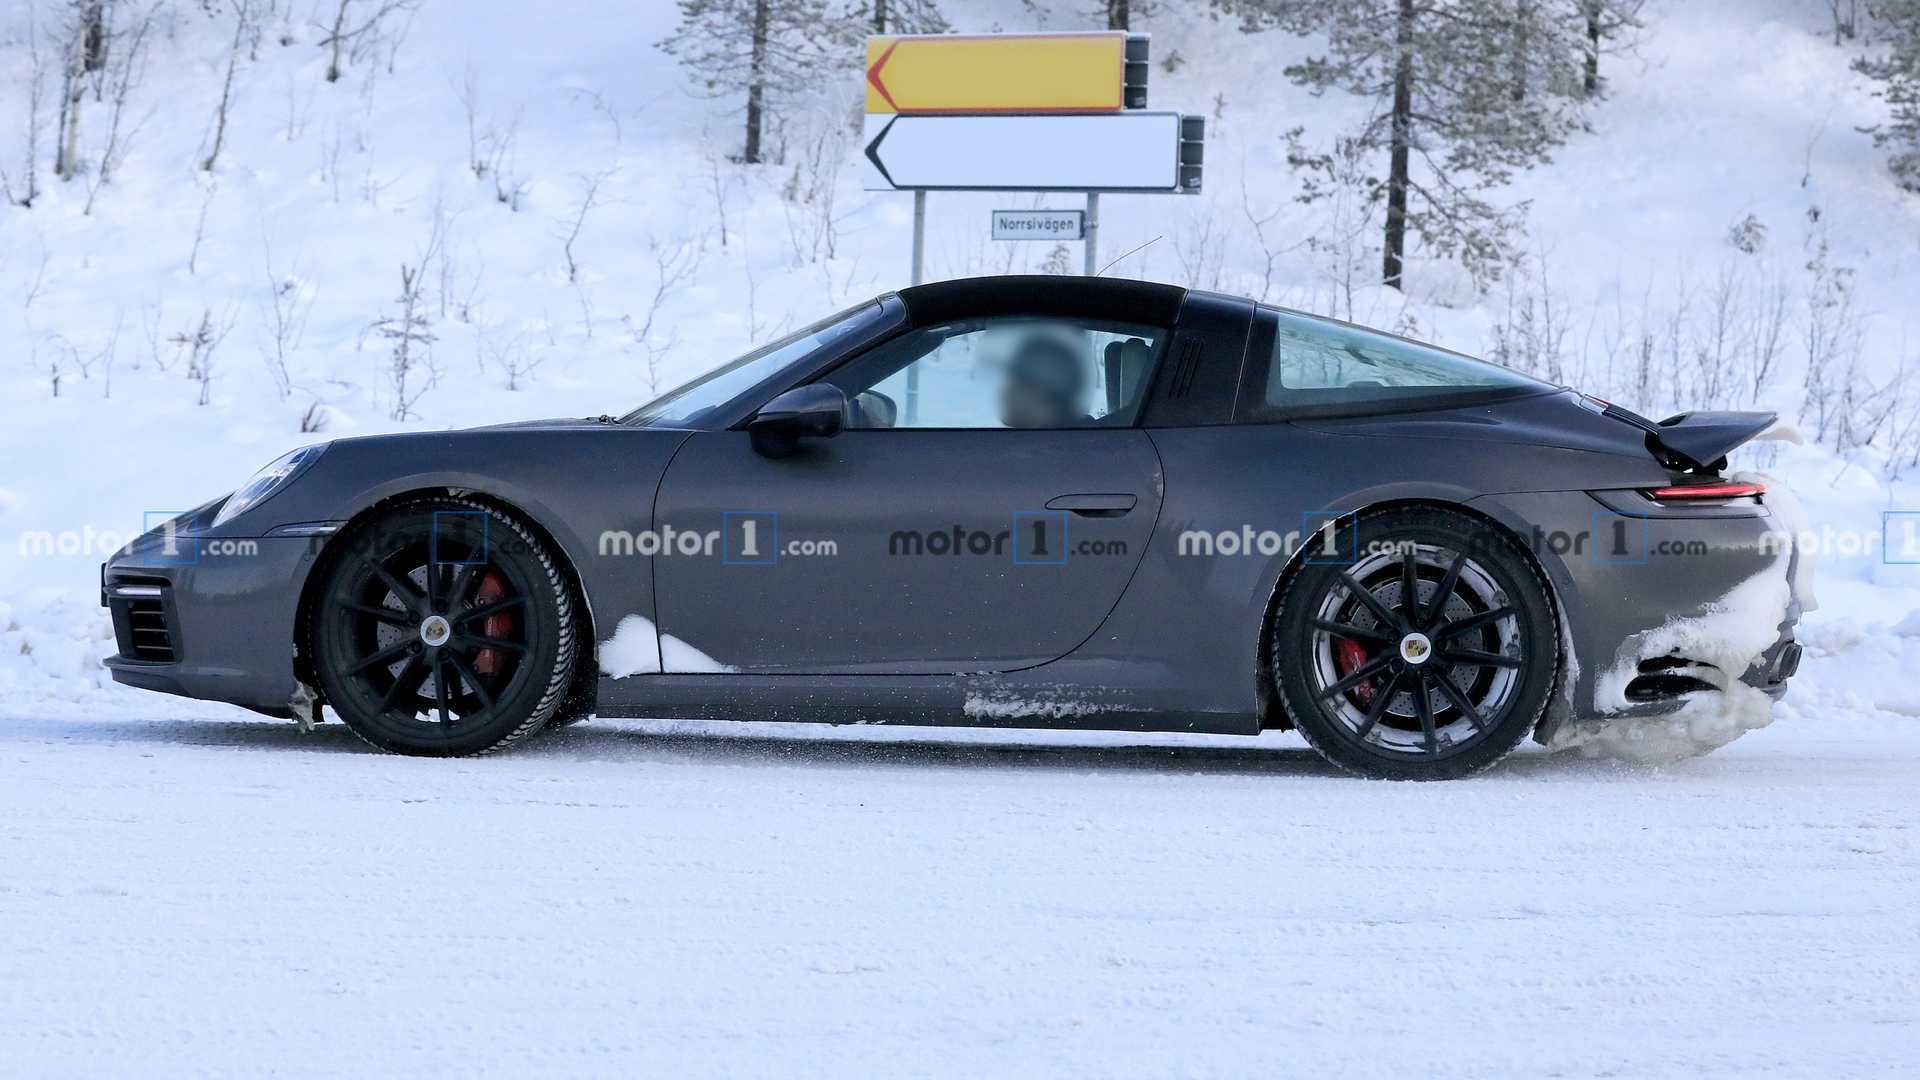 Porsche 911 Targa Spy Photos Porsche-911-targa-spy-photo